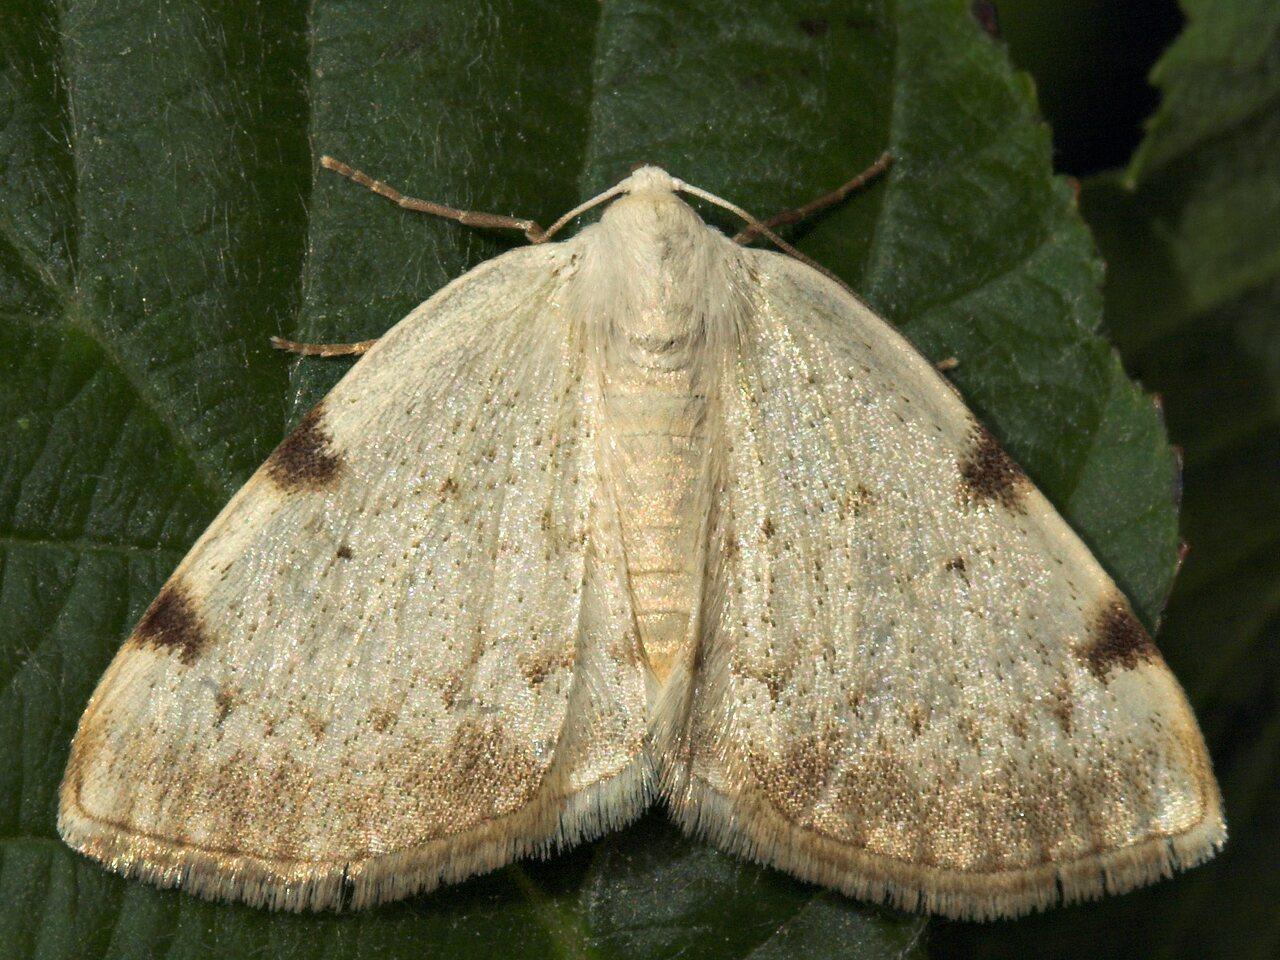 Lomographa-bimaculata-8043.jpg